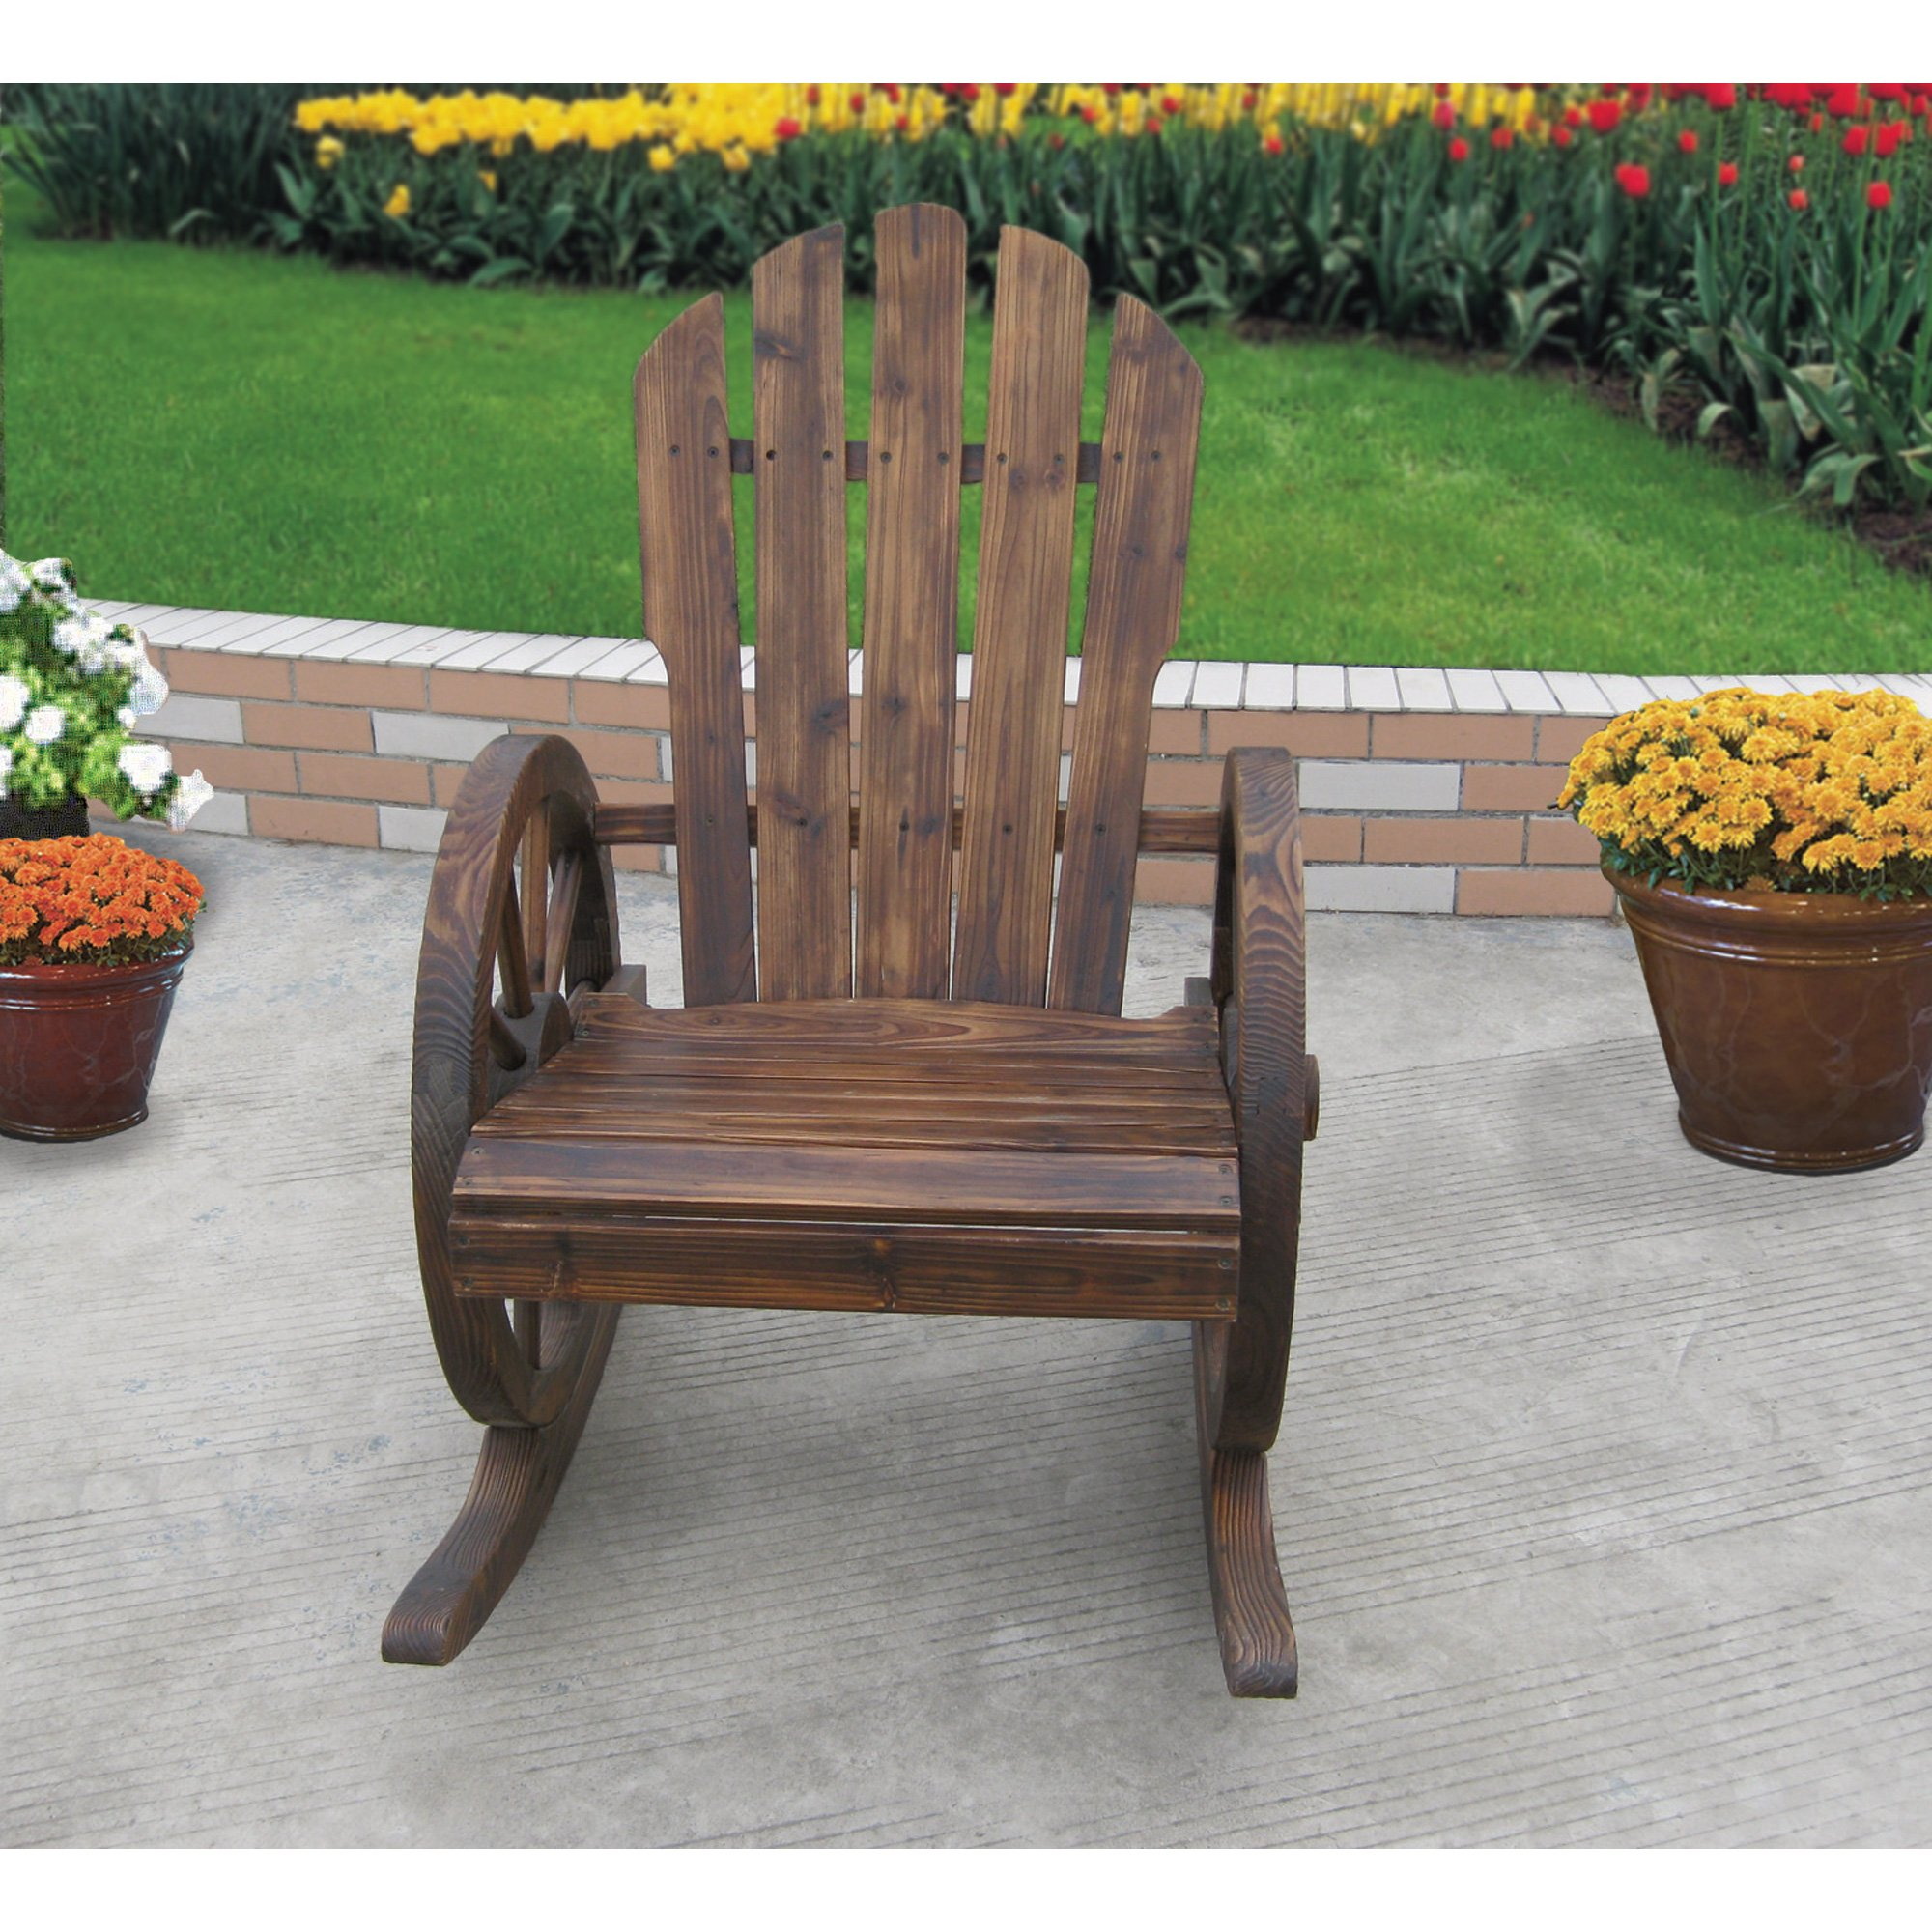 Kotulas Wagon Wheel Rocker Chair by Kotulas